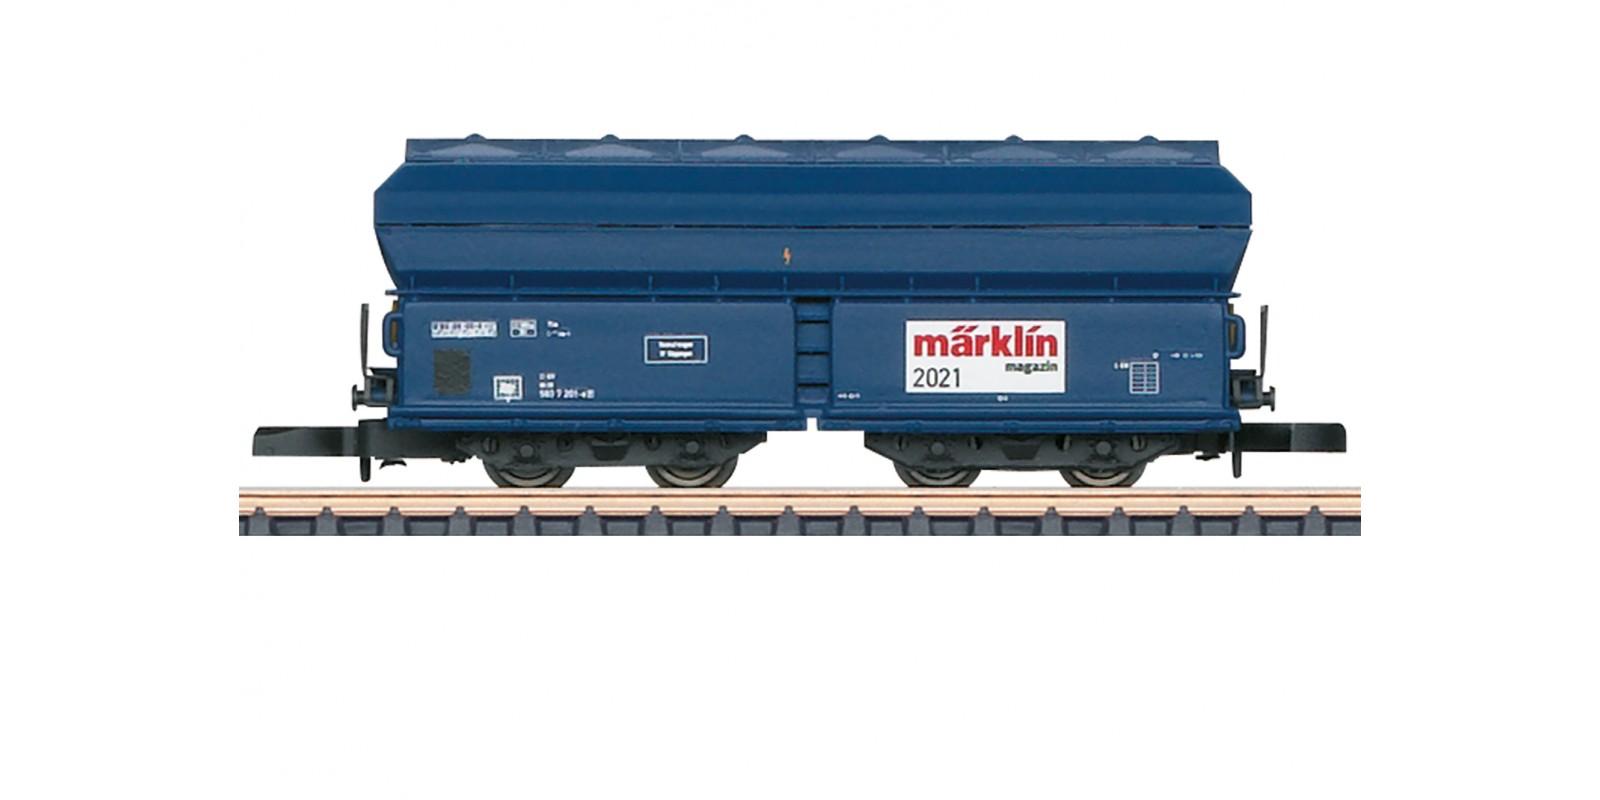 080831 Märklin Magazin Z Gauge Annual Car for 2021